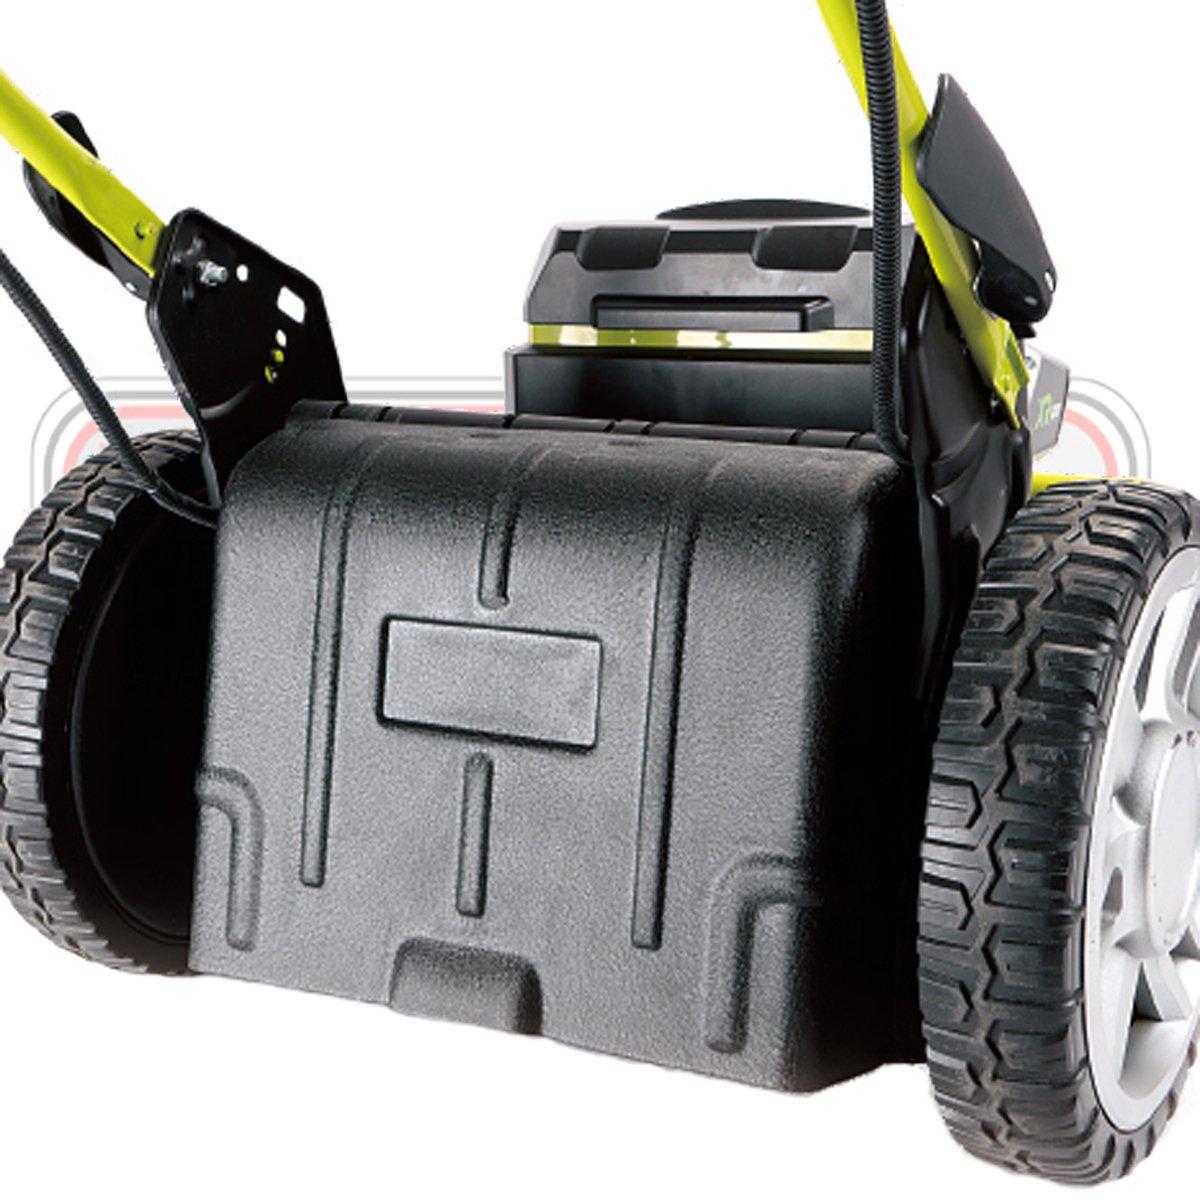 Cortacesped de bateria potente profesional autopropulsado mulching G-Force XR 120 LM 53 SP